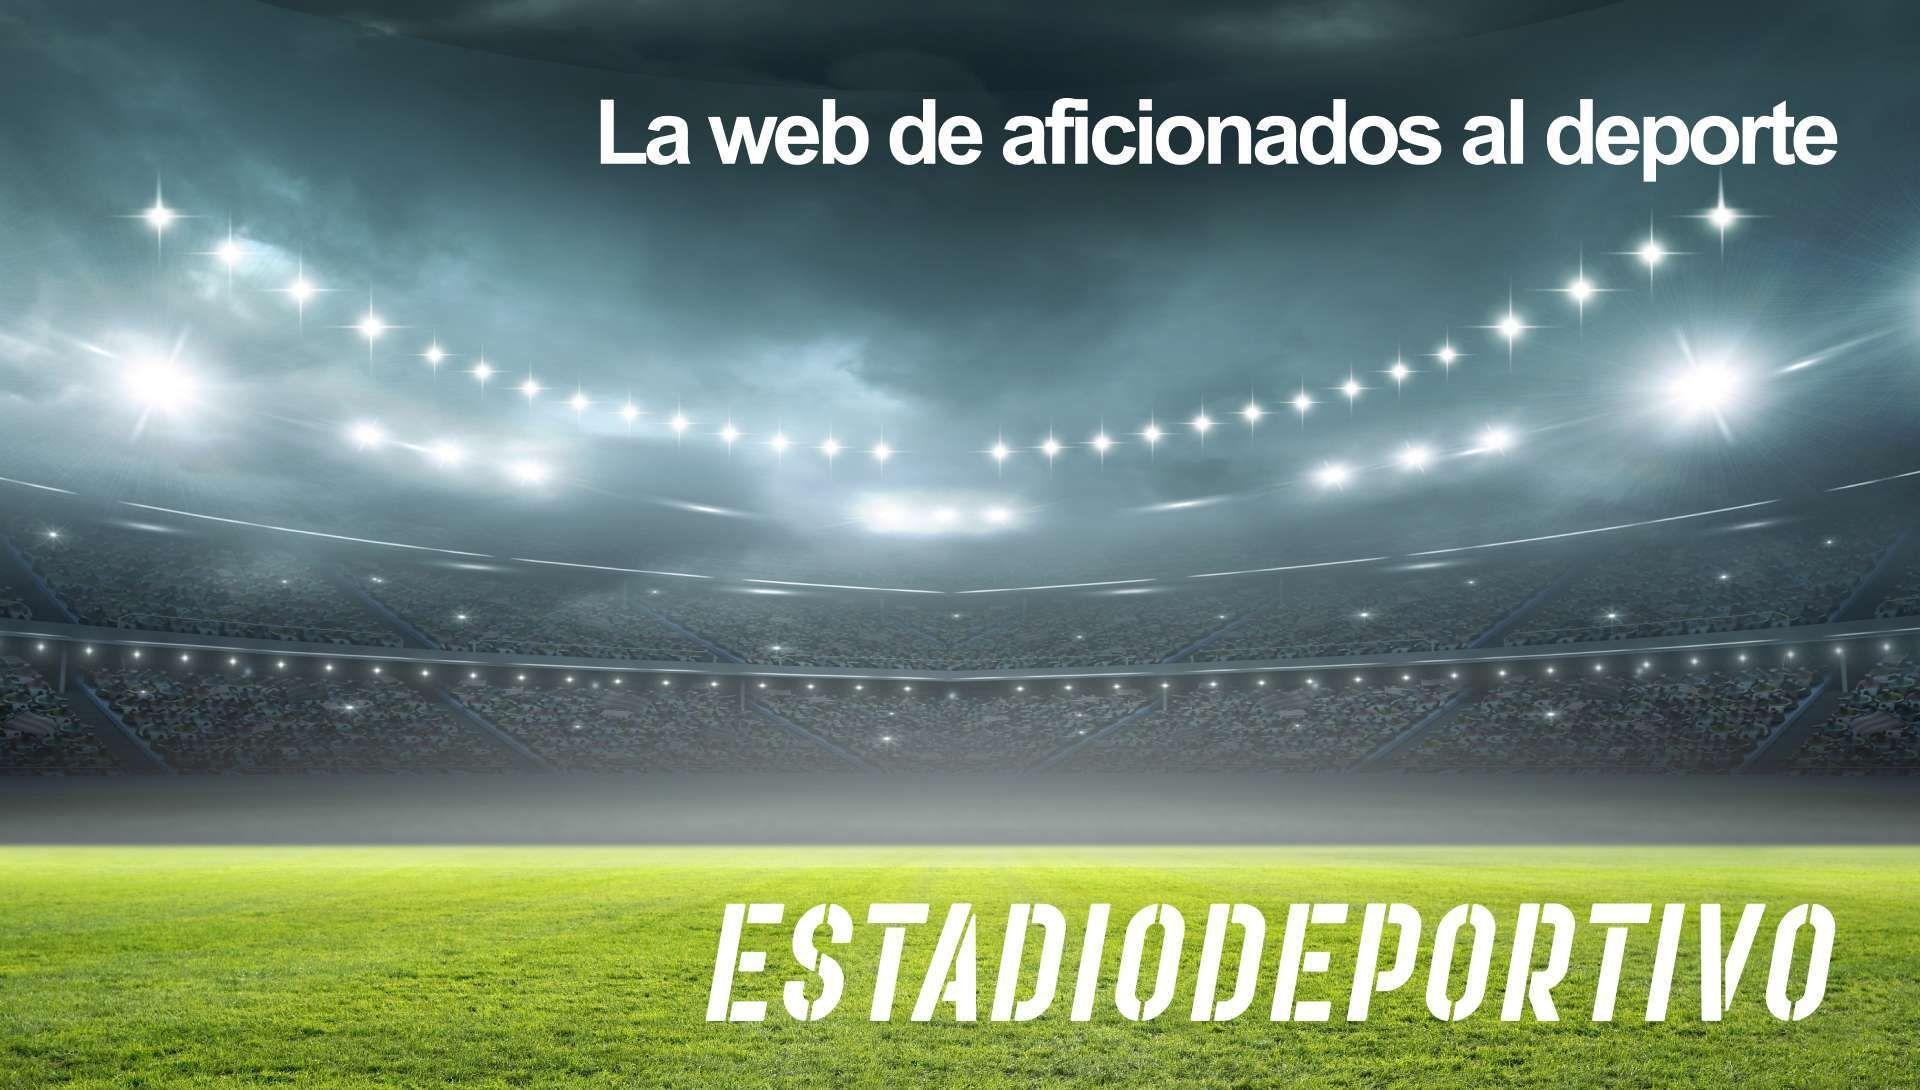 El análisis del Liverpool